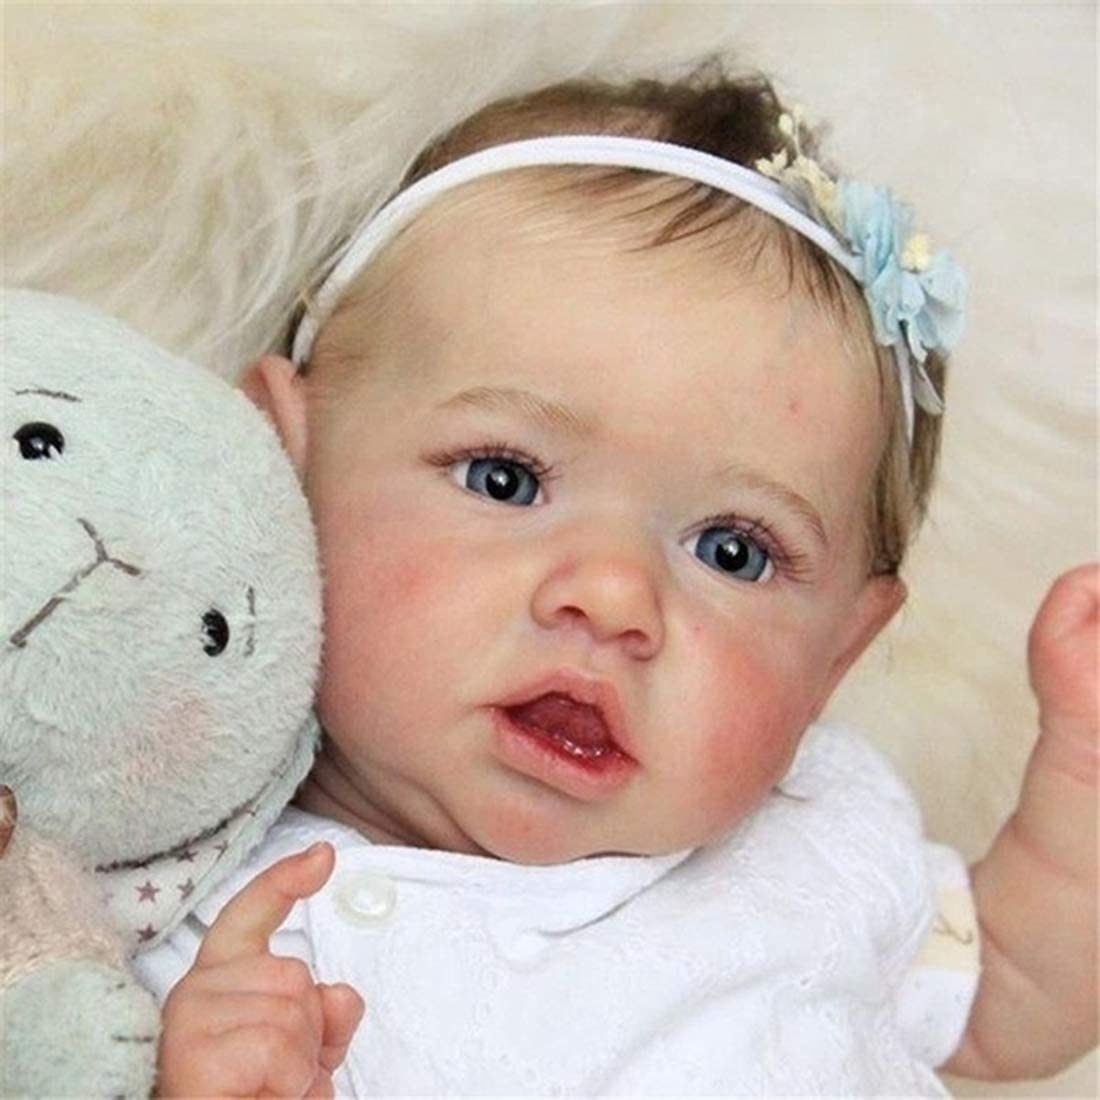 FLJUN 23 Pulgadas 58 Centímetros Realista Saskia Muñecas Reborn Chica De Ojos Grises Muñeca Recién Nacida Silicona Completa Suave Natural Nutrir Muñecas Ligero Lavable Muñeca Juguetes para Niños